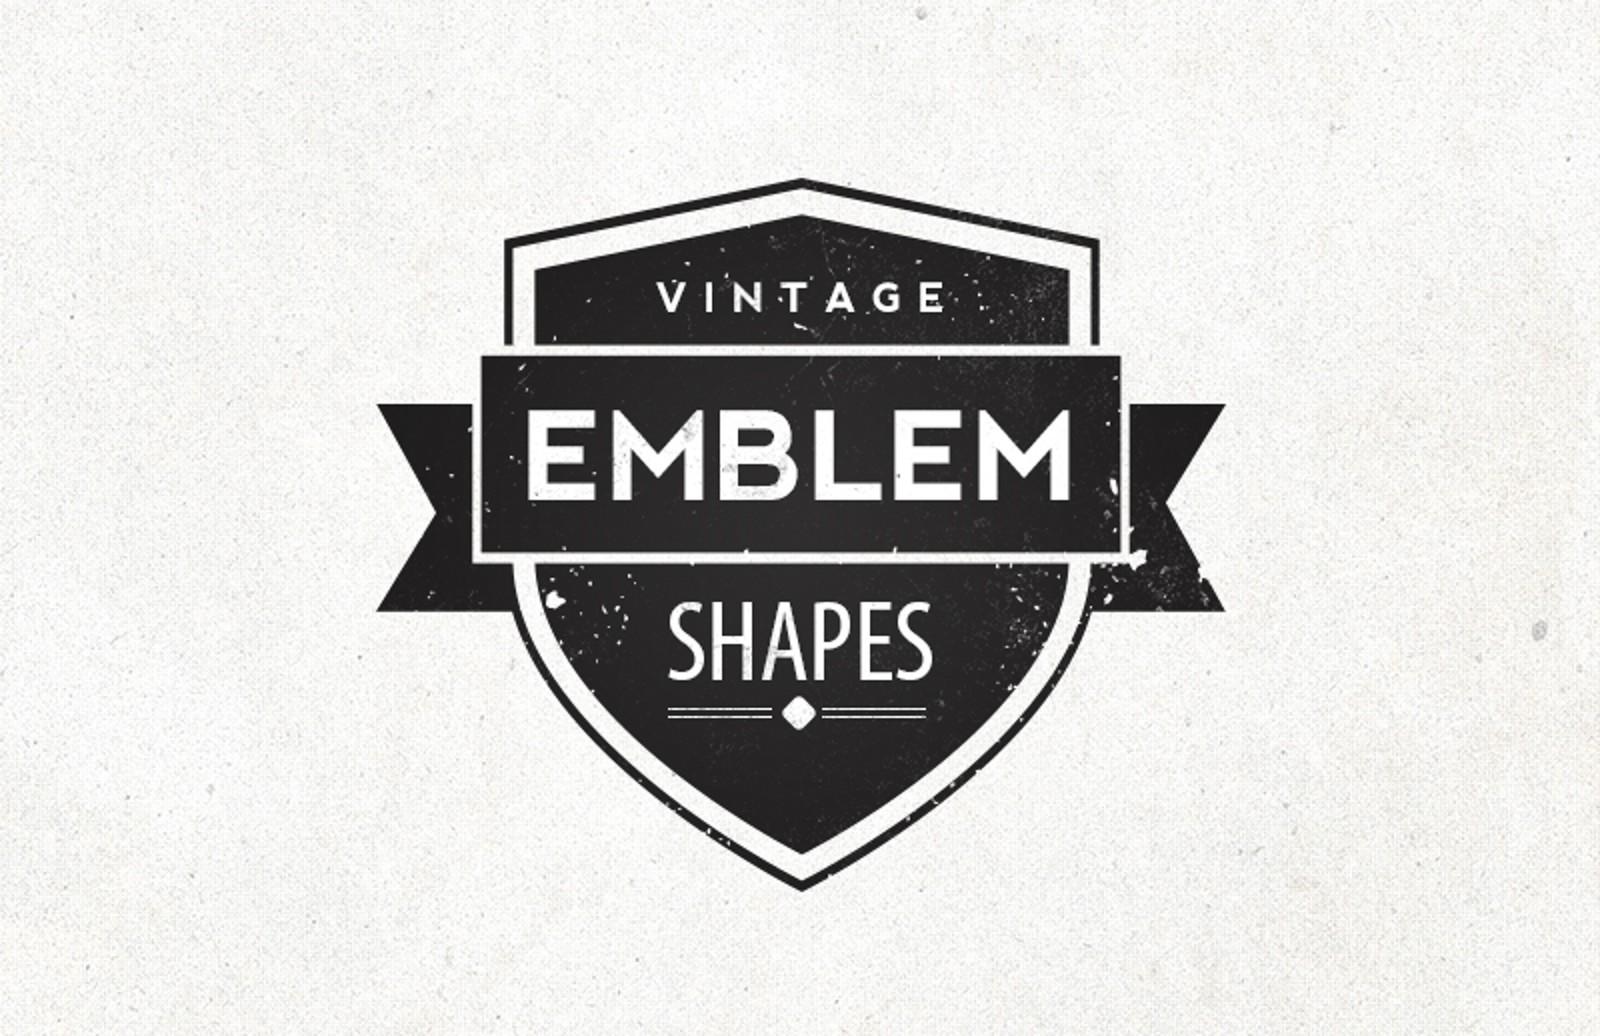 Vintage Emblem Shapes 800X518 1